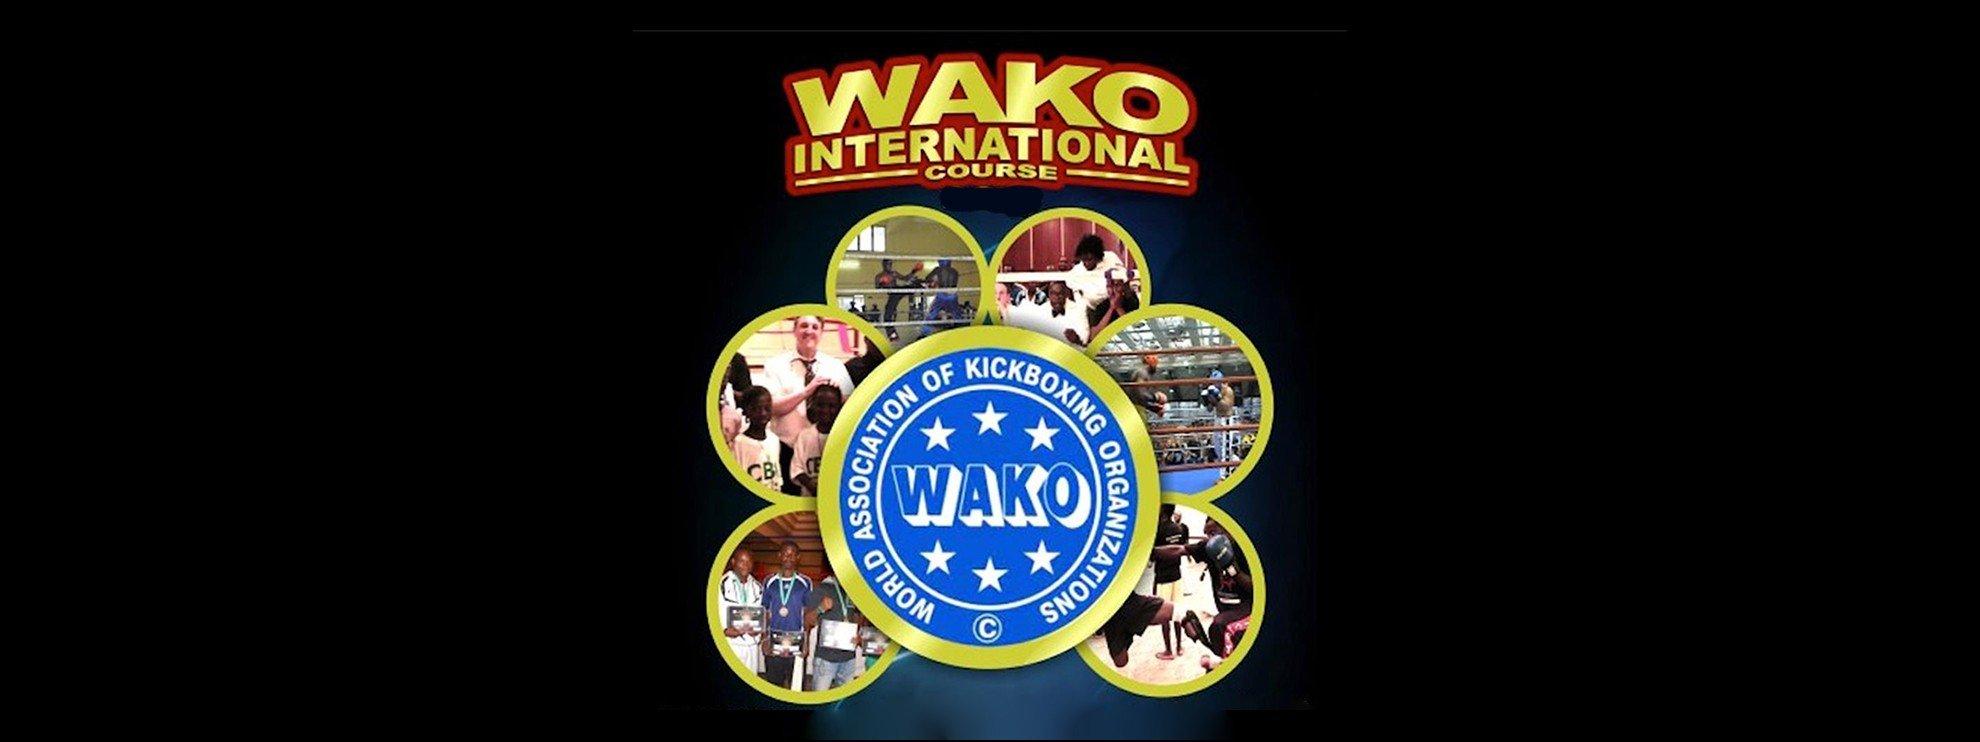 performer WAKO kickboxing Federation